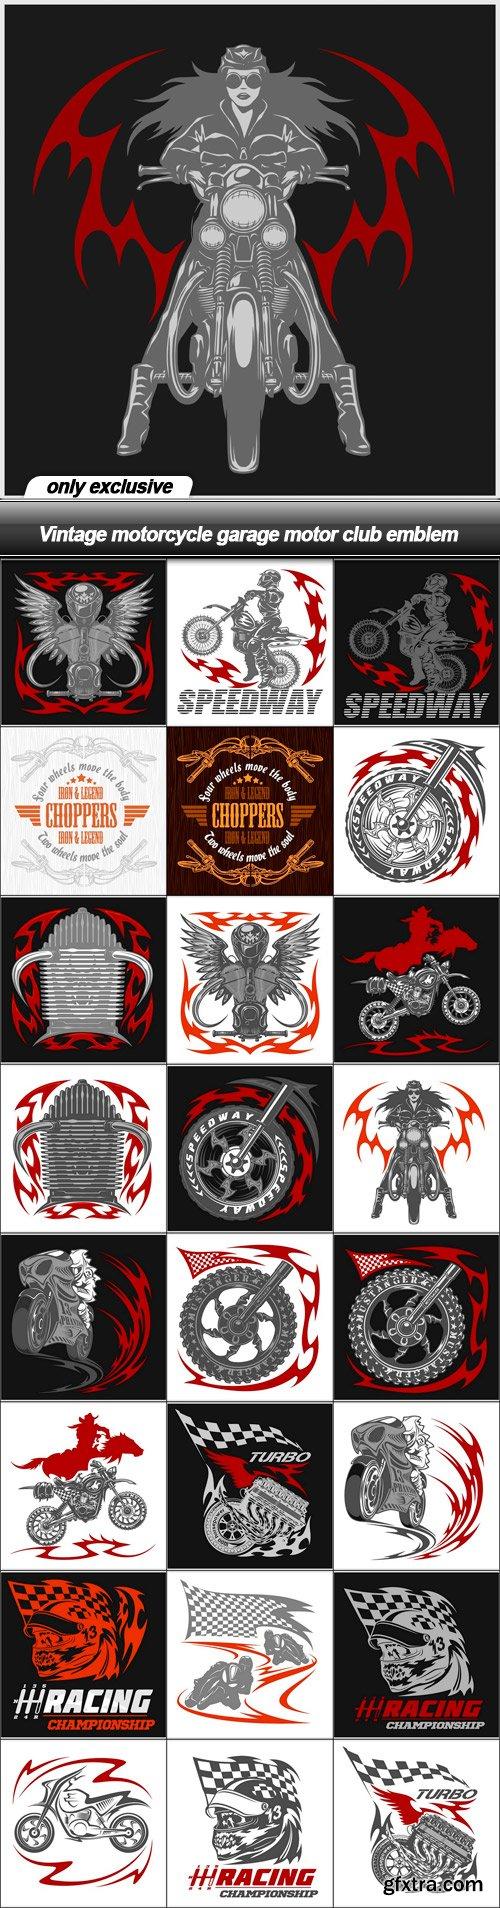 Vintage motorcycle garage motor club emblem - 25 EPS